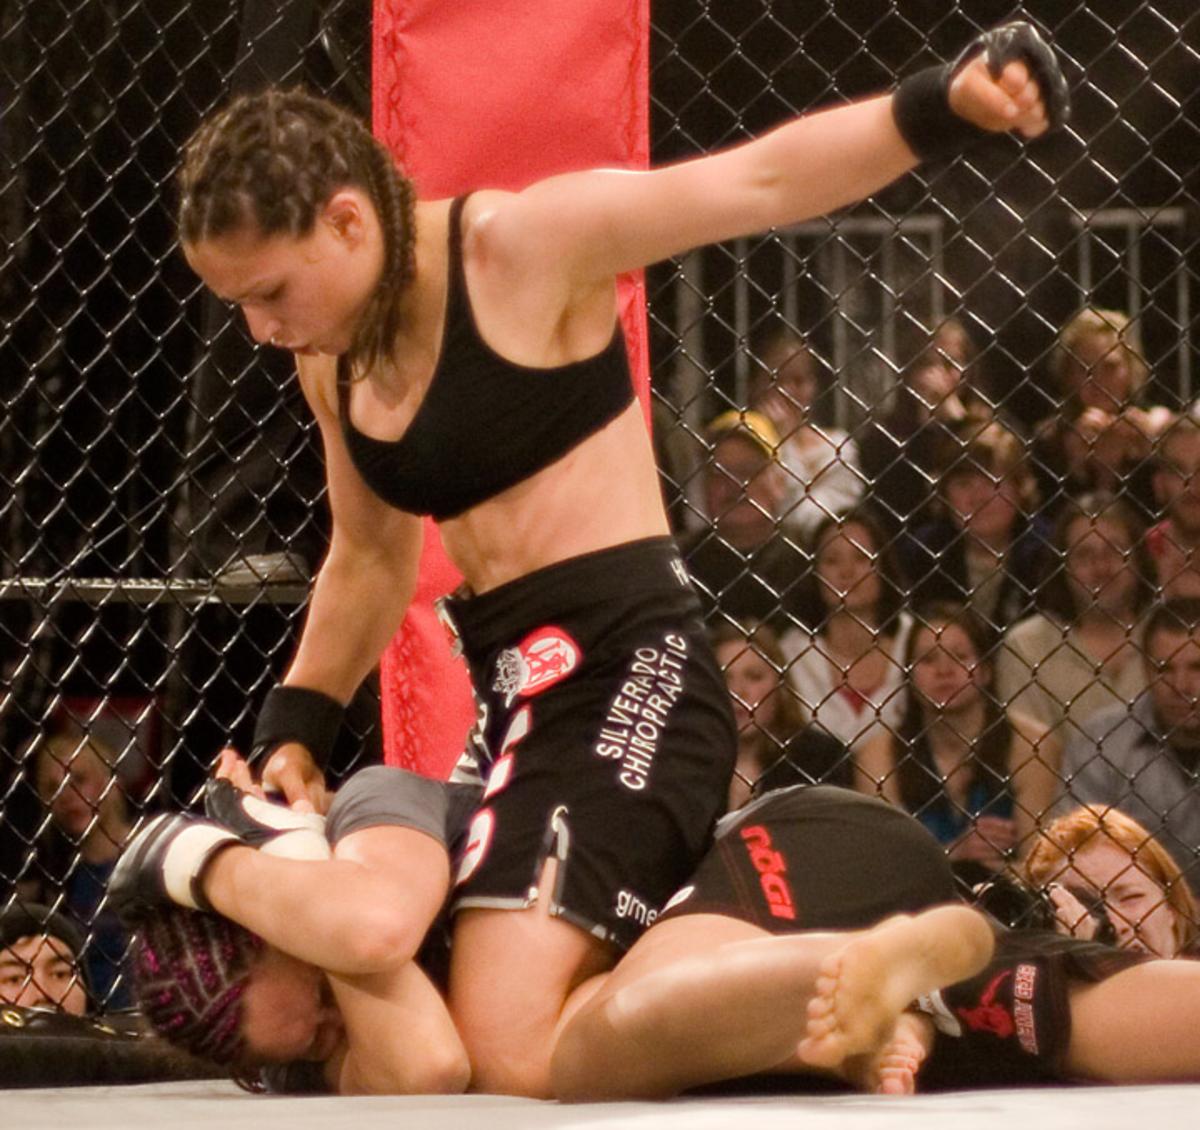 MMA fighter Gina Carano